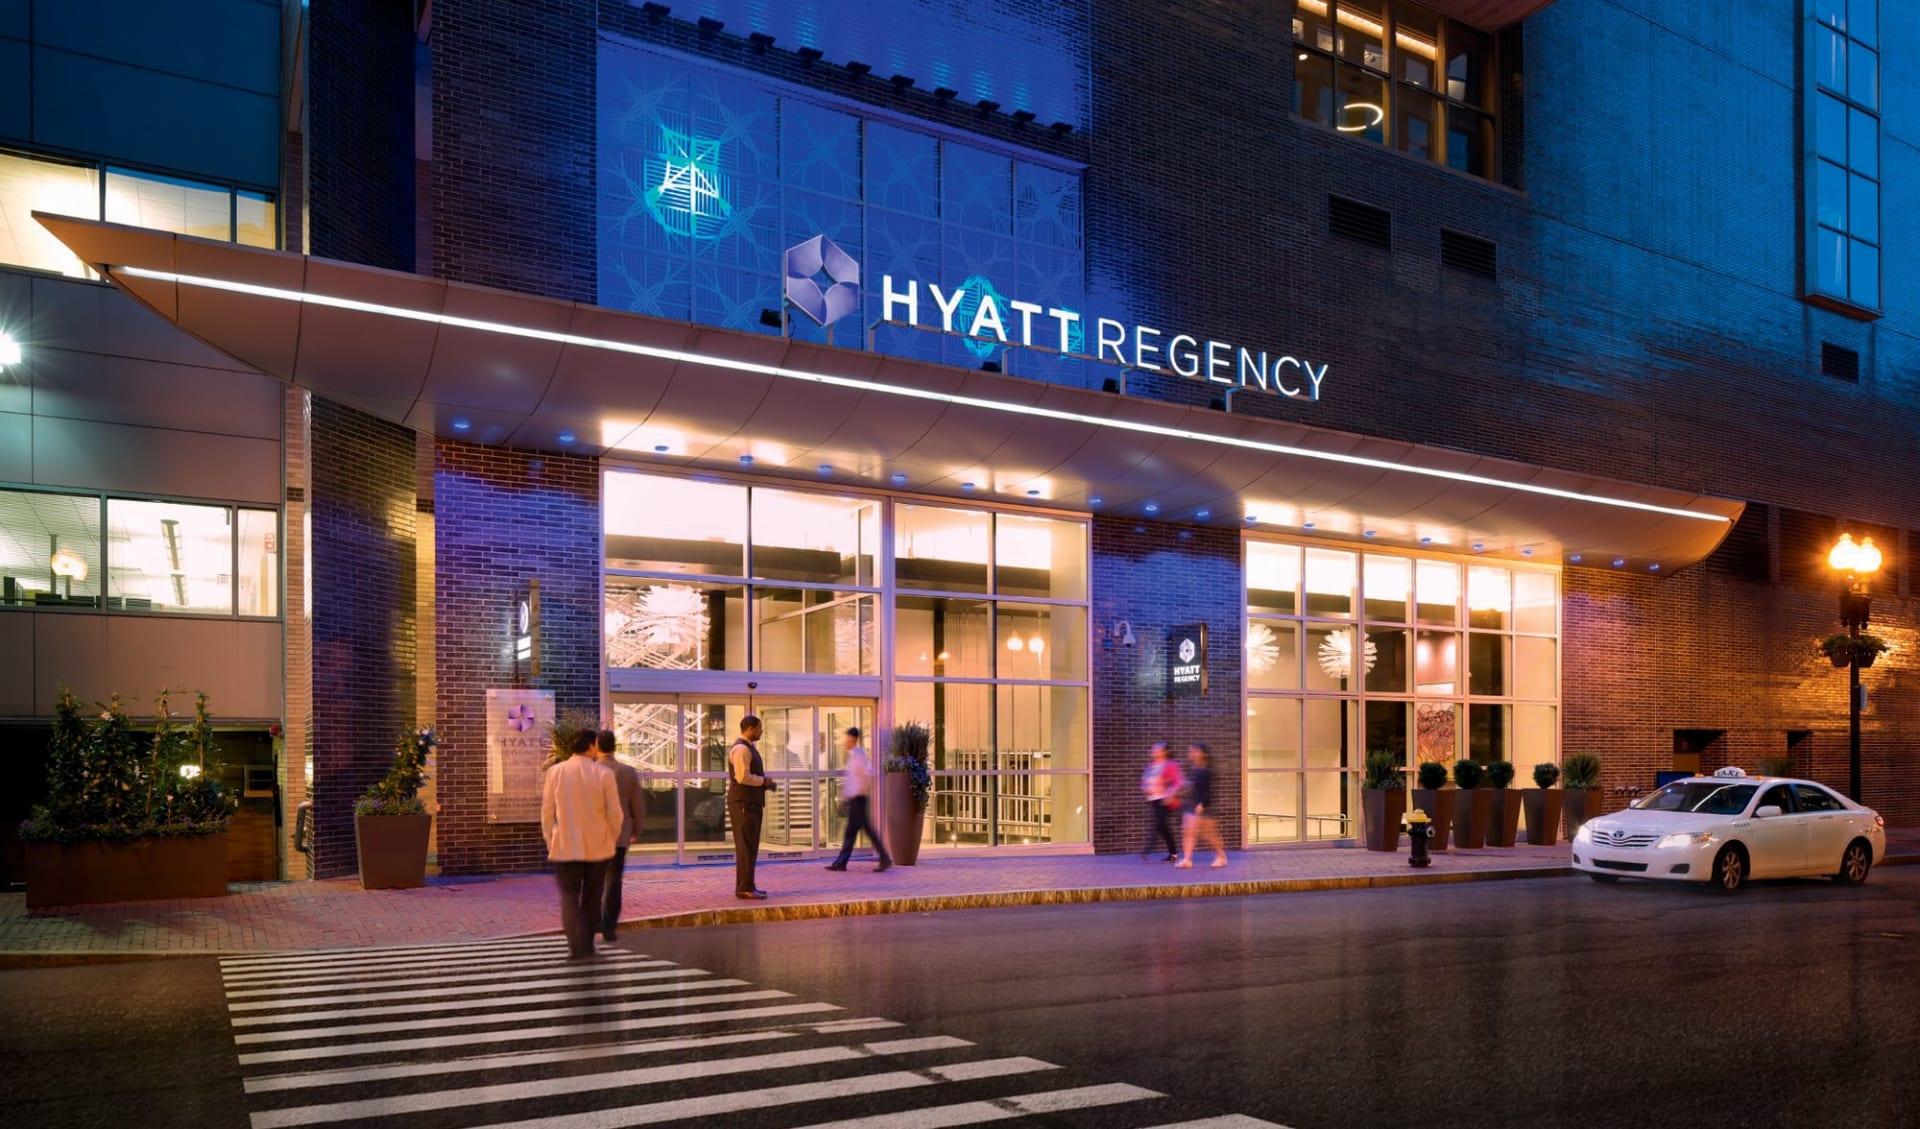 Hyatt Regency Boston: exterior hyatt regency hoteleingang strasse